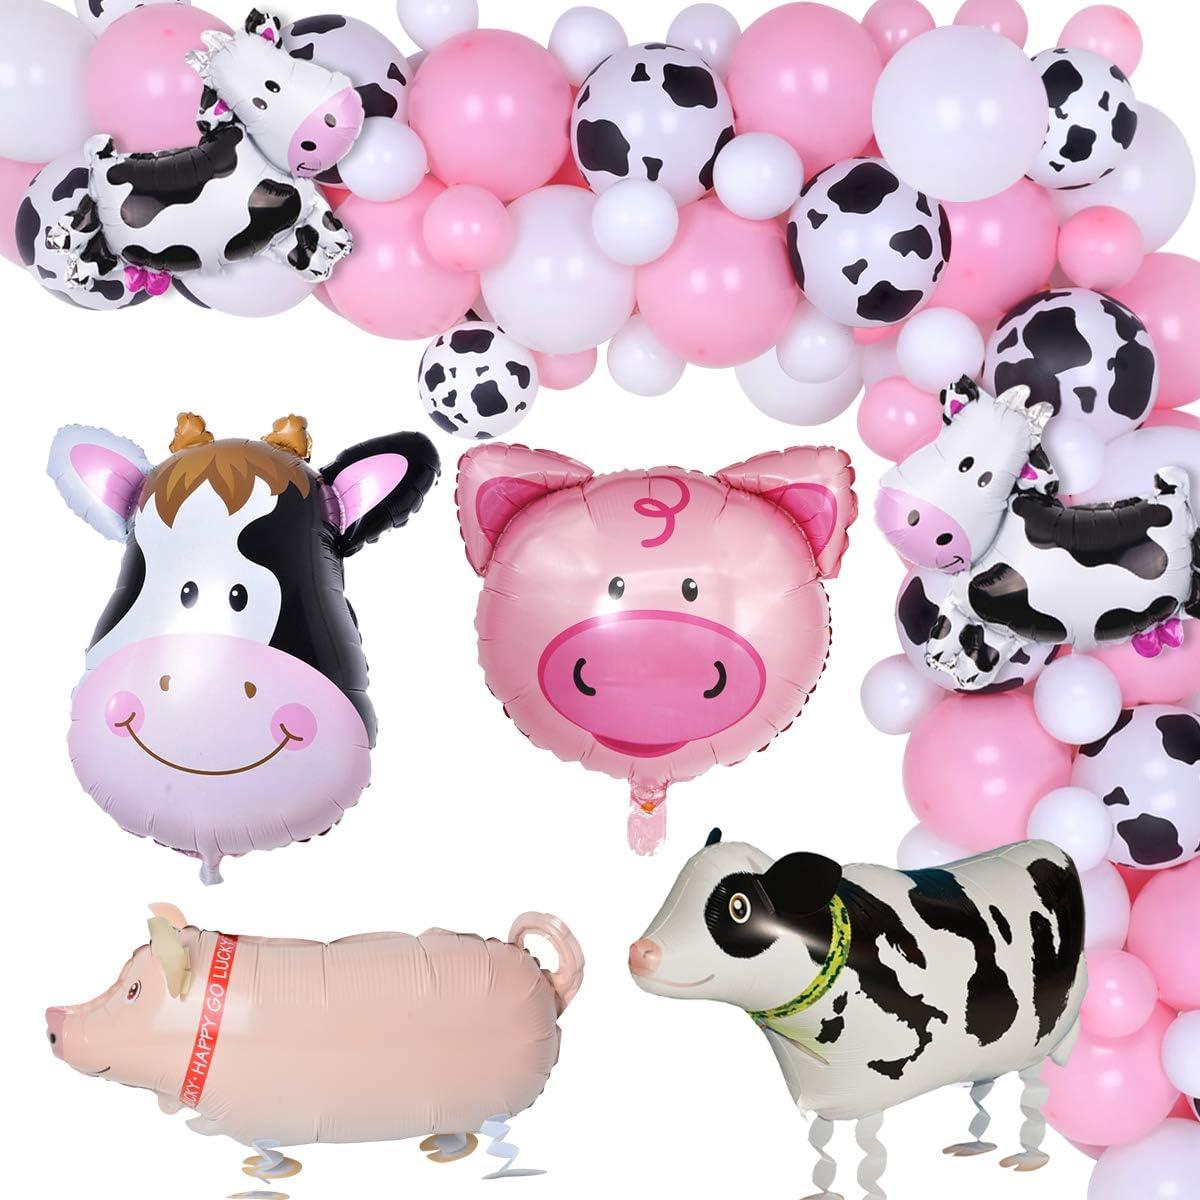 HEETON Cow Birthday Party Decorations Balloon Arch Kit Happy Birthday Banner Cow Balloon Farm Baby Pink Balloons Cow Birthday Party Baby Girl Photo